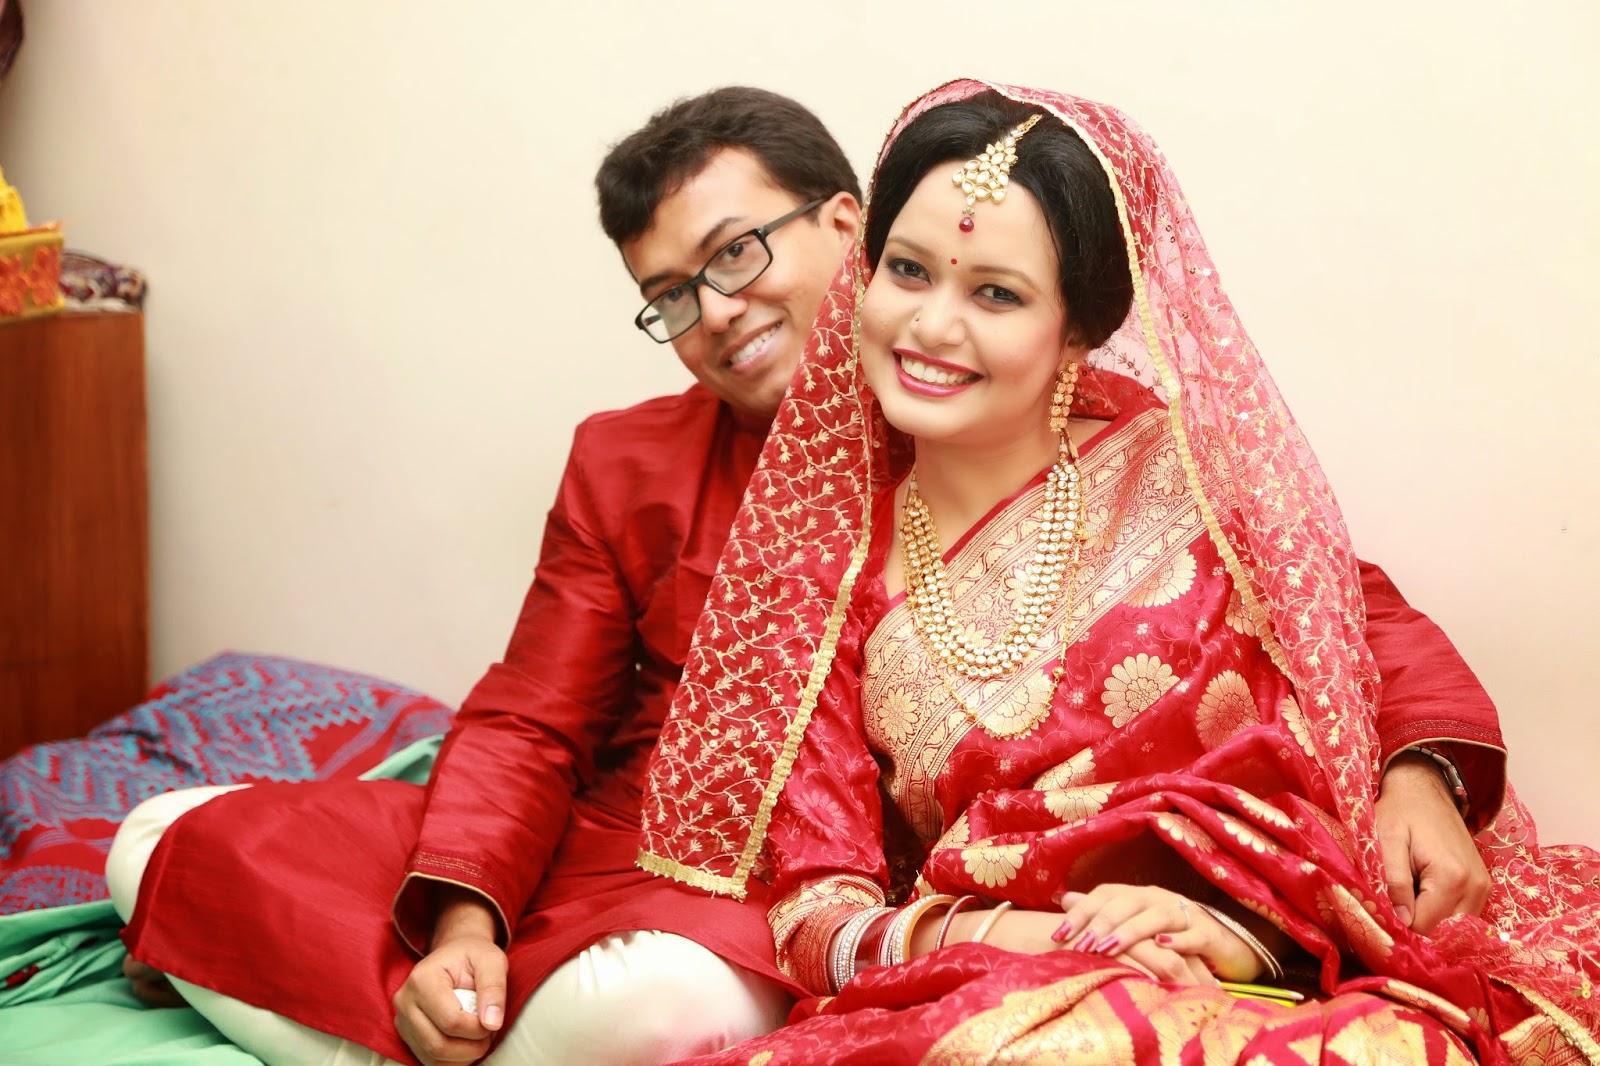 The BD bride: Real Wedding: Anika and Mayaz